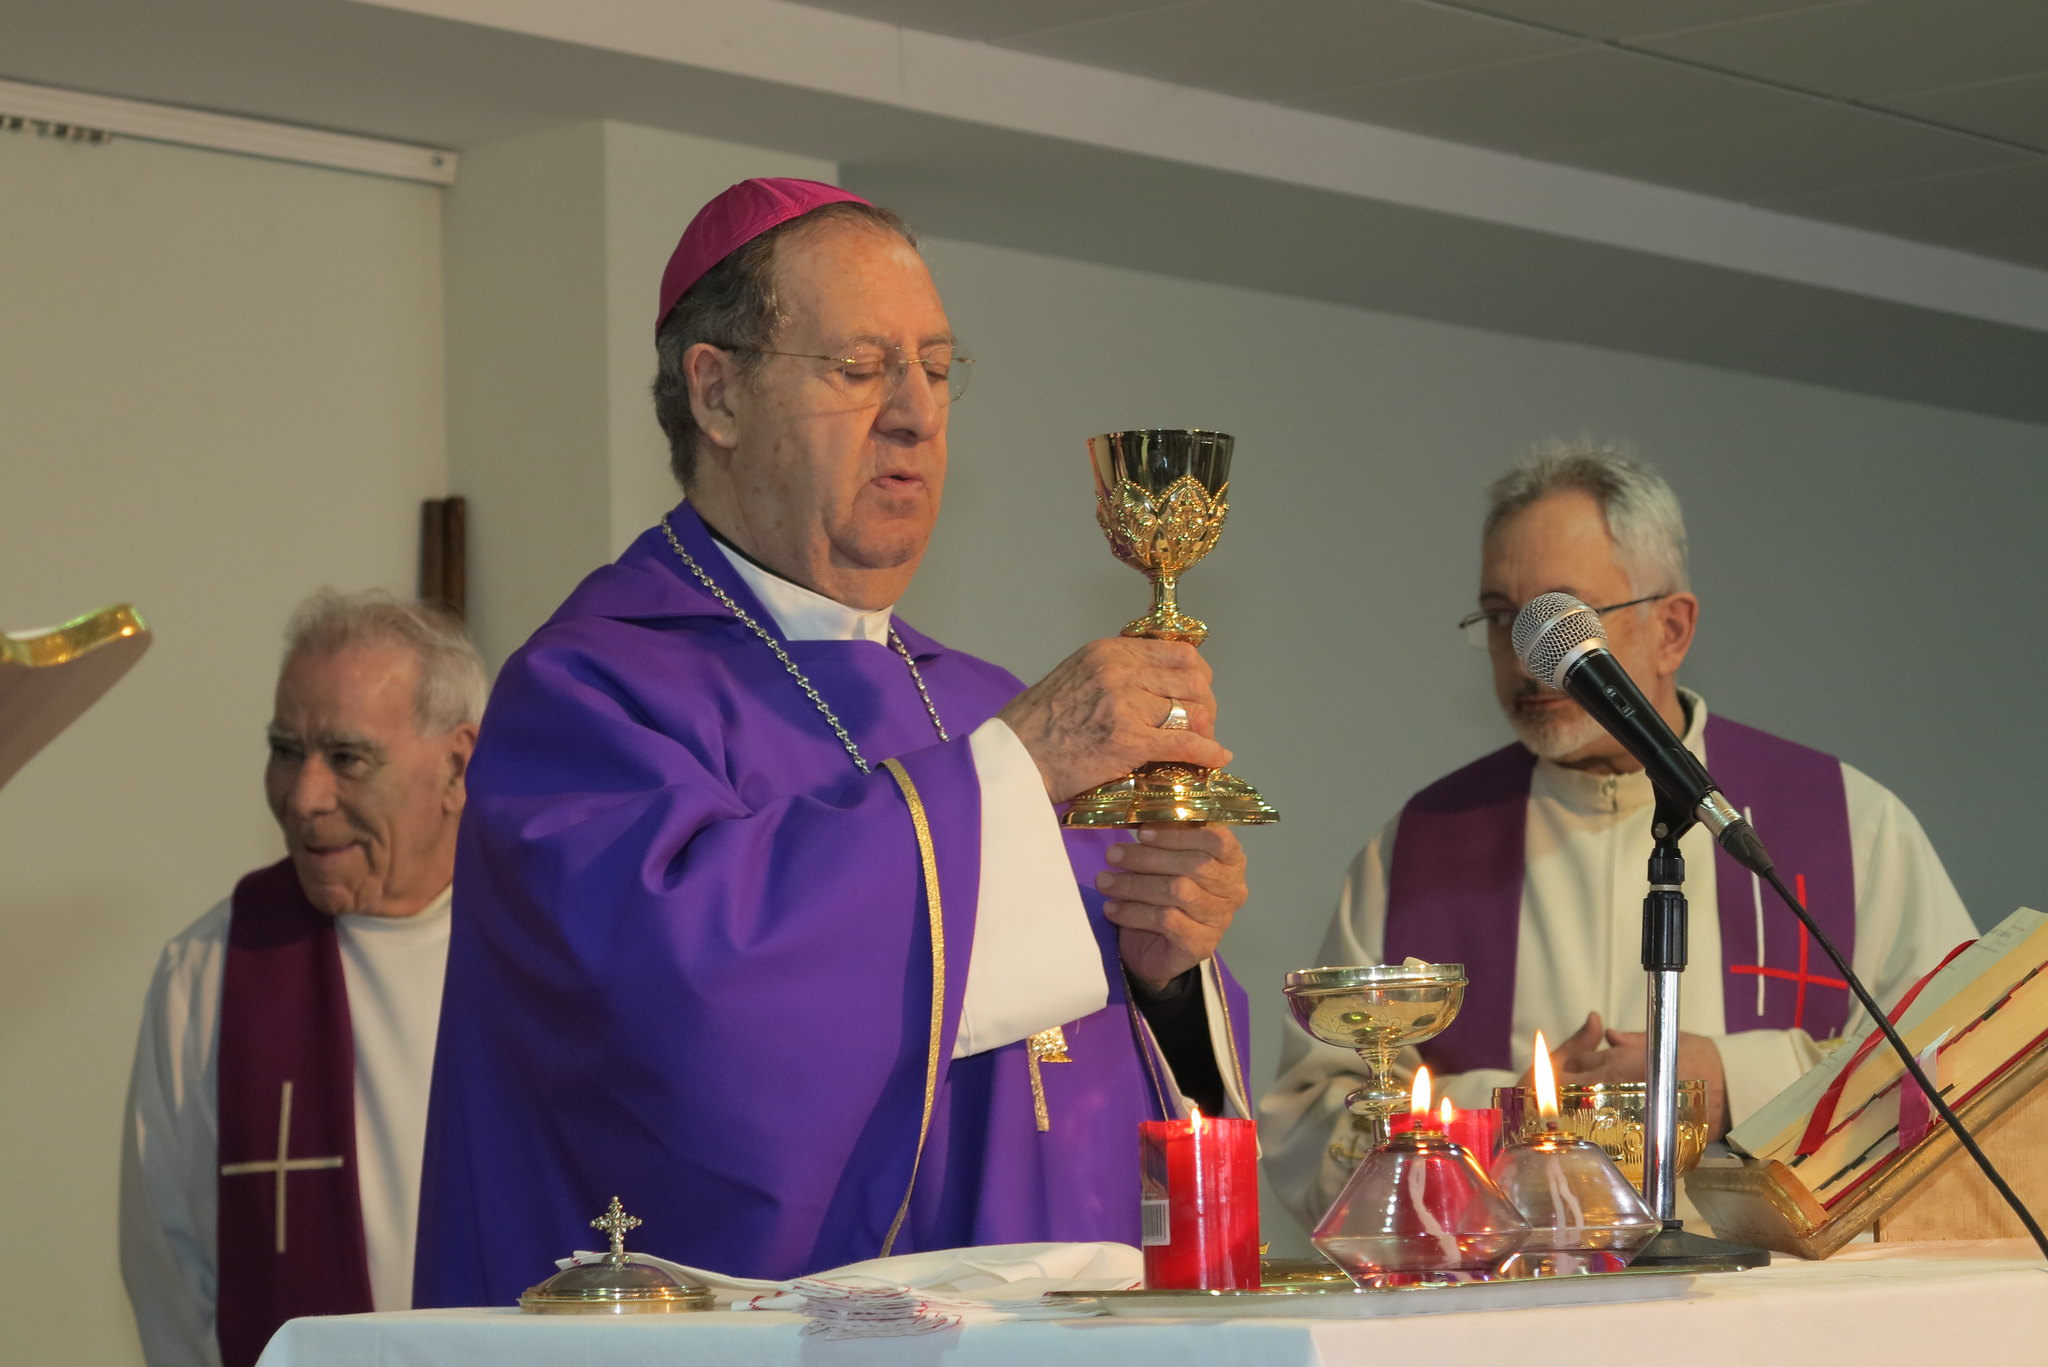 (2016-02-13) - Inauguración Virgen de Lourdes, La Molineta - Archivo La Molineta 2 (29)